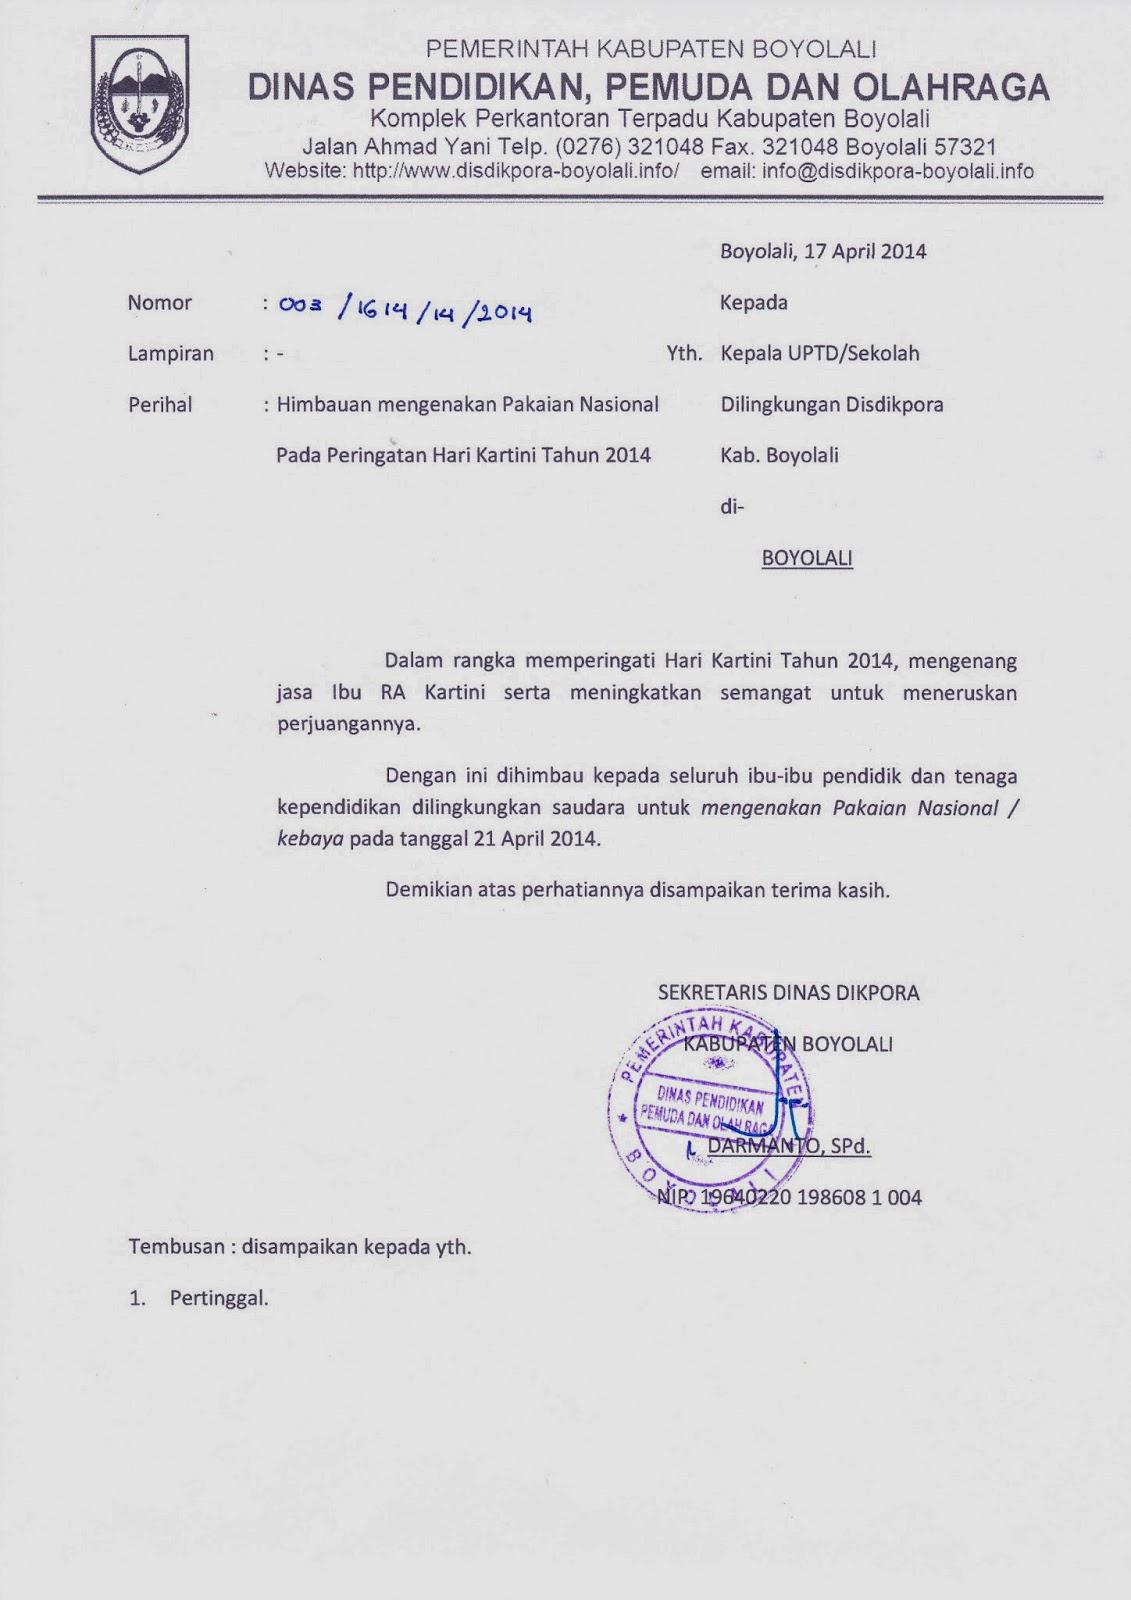 Info Sma Smk Kabupaten Boyolali Himbauan Mengenakan Pakaian